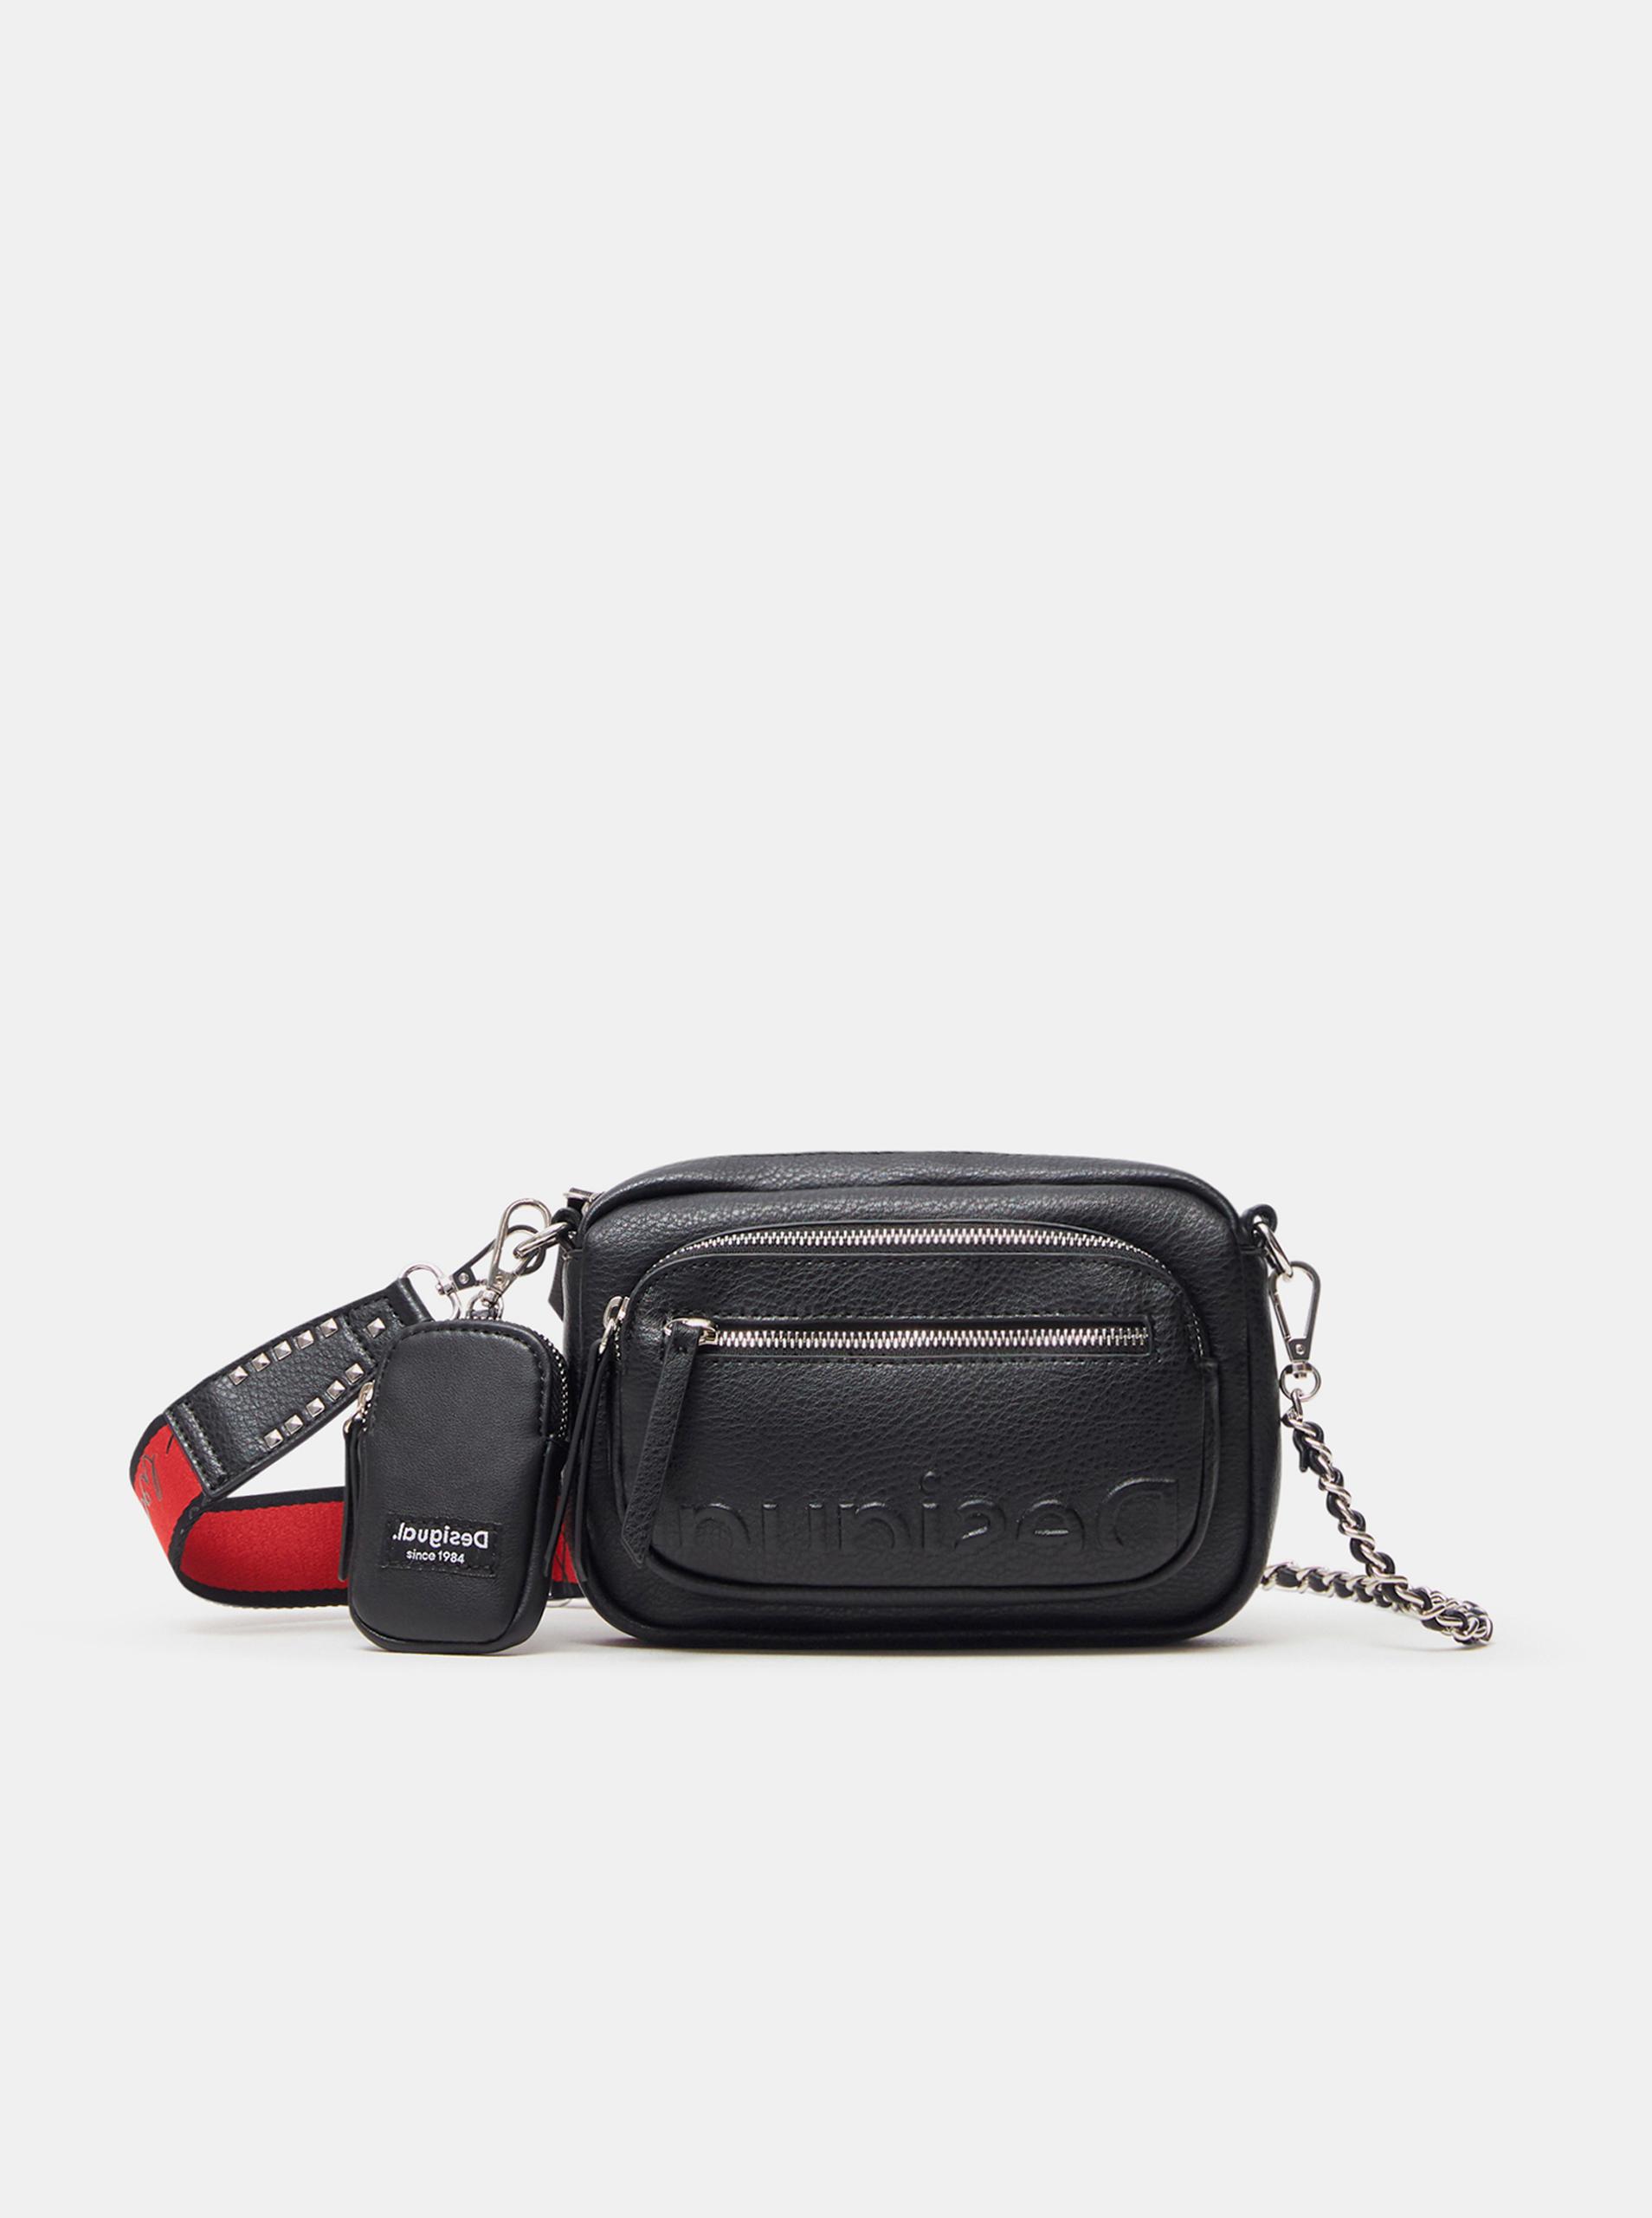 Desigual Women's bag black  Embossed